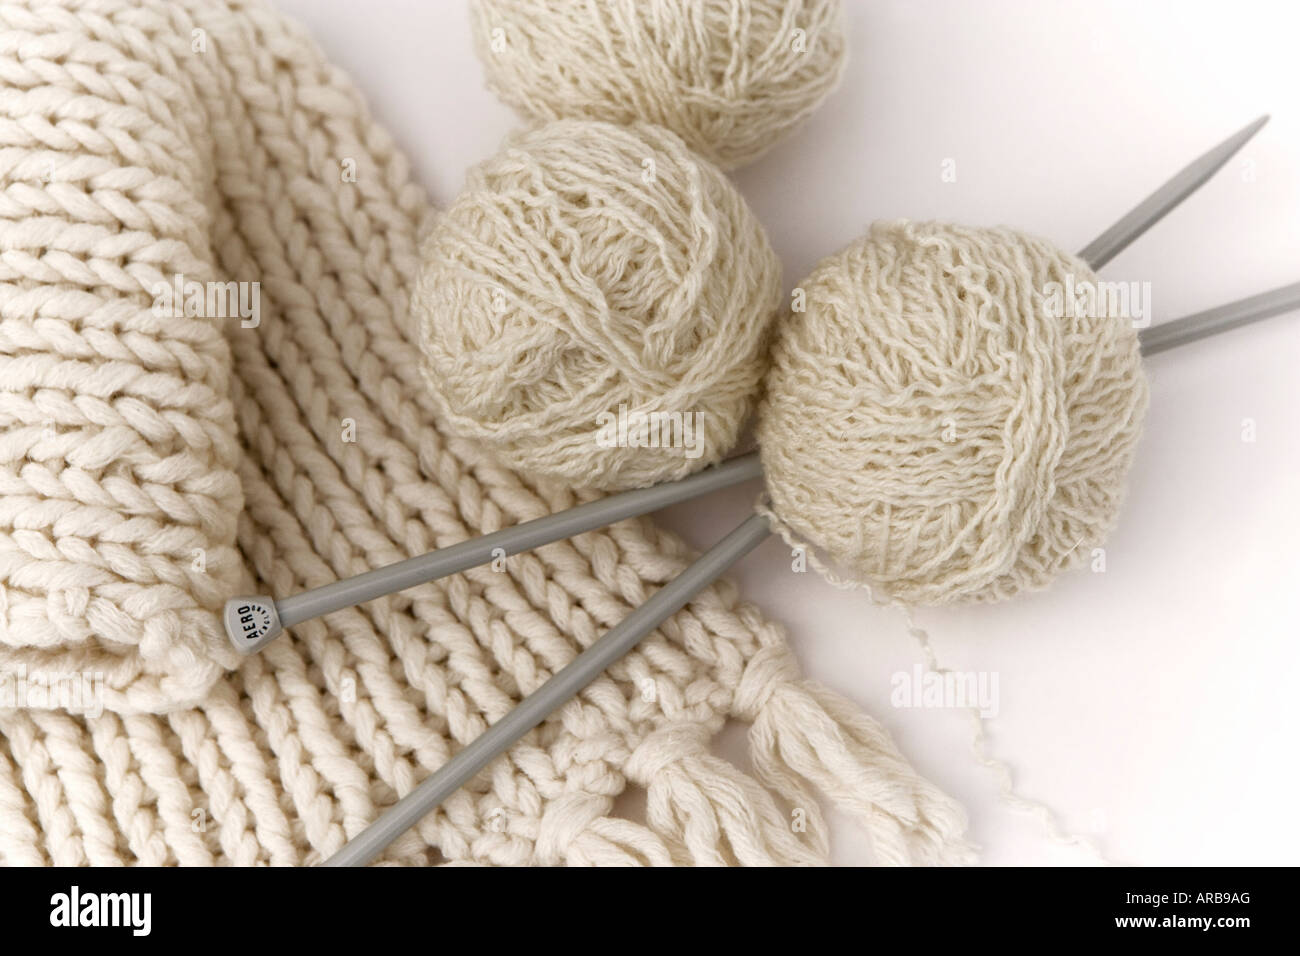 Knitting Needles And Wool : Knitting needles and wool pixshark images